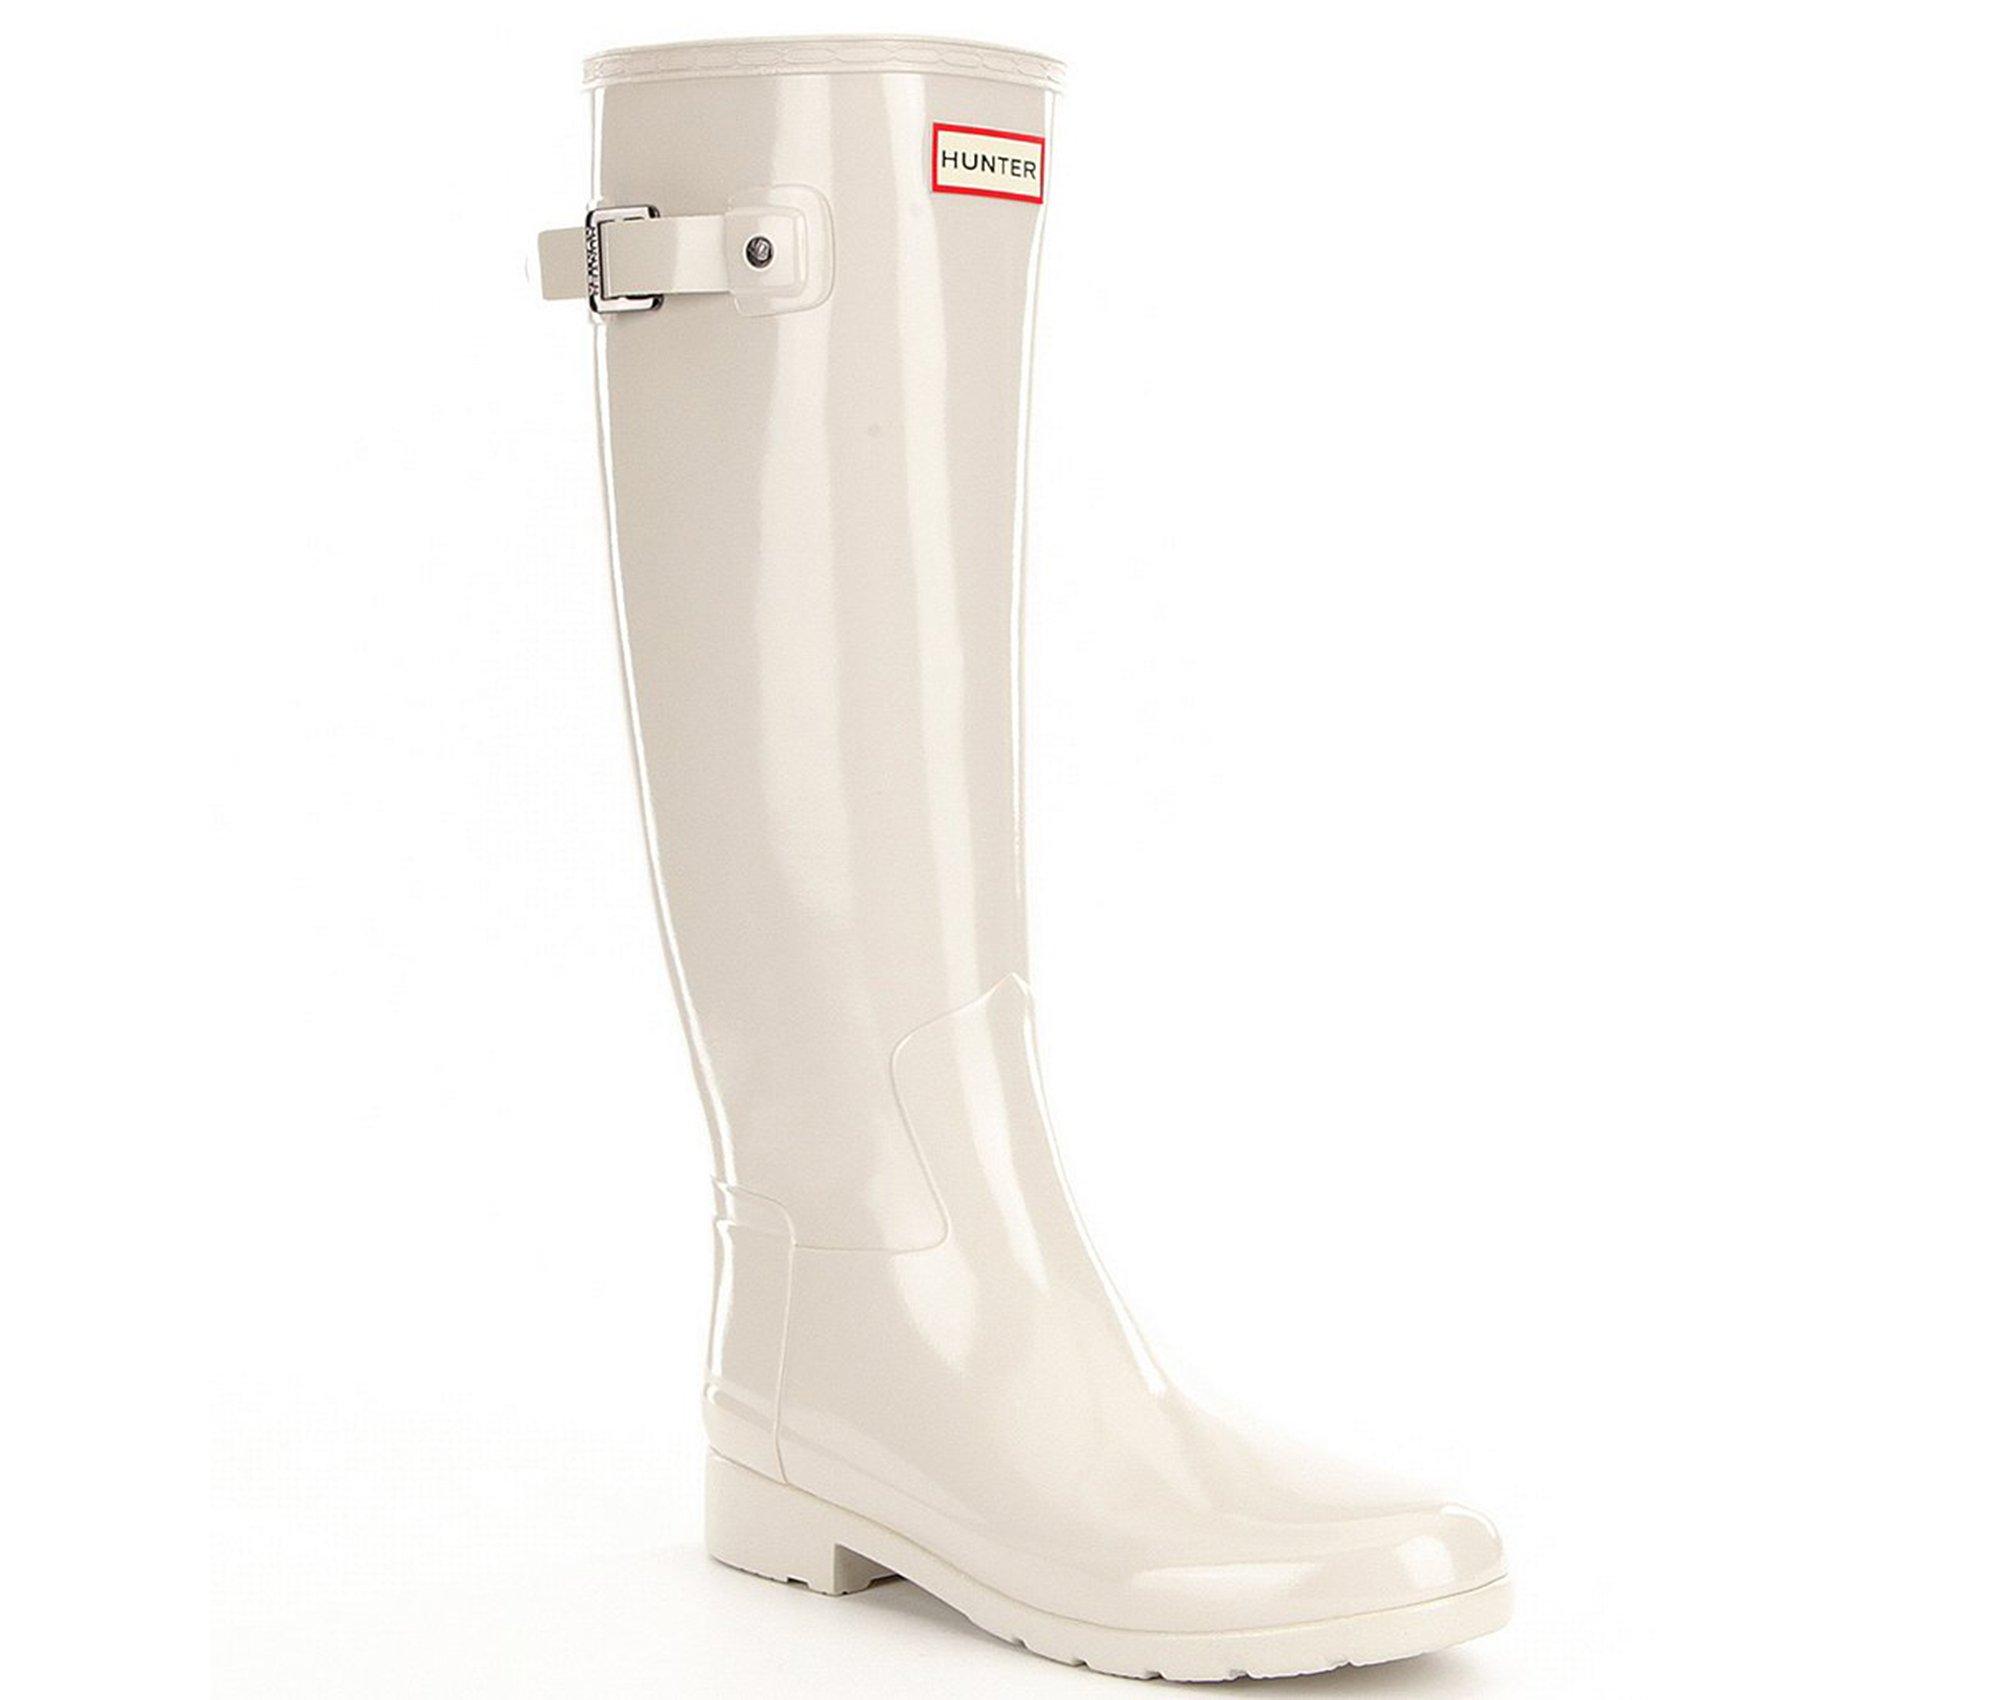 Hunter Womens Original Refined Gloss Wellingtons Snow Winter Rain Boots, Parchment, 5 B(M) US